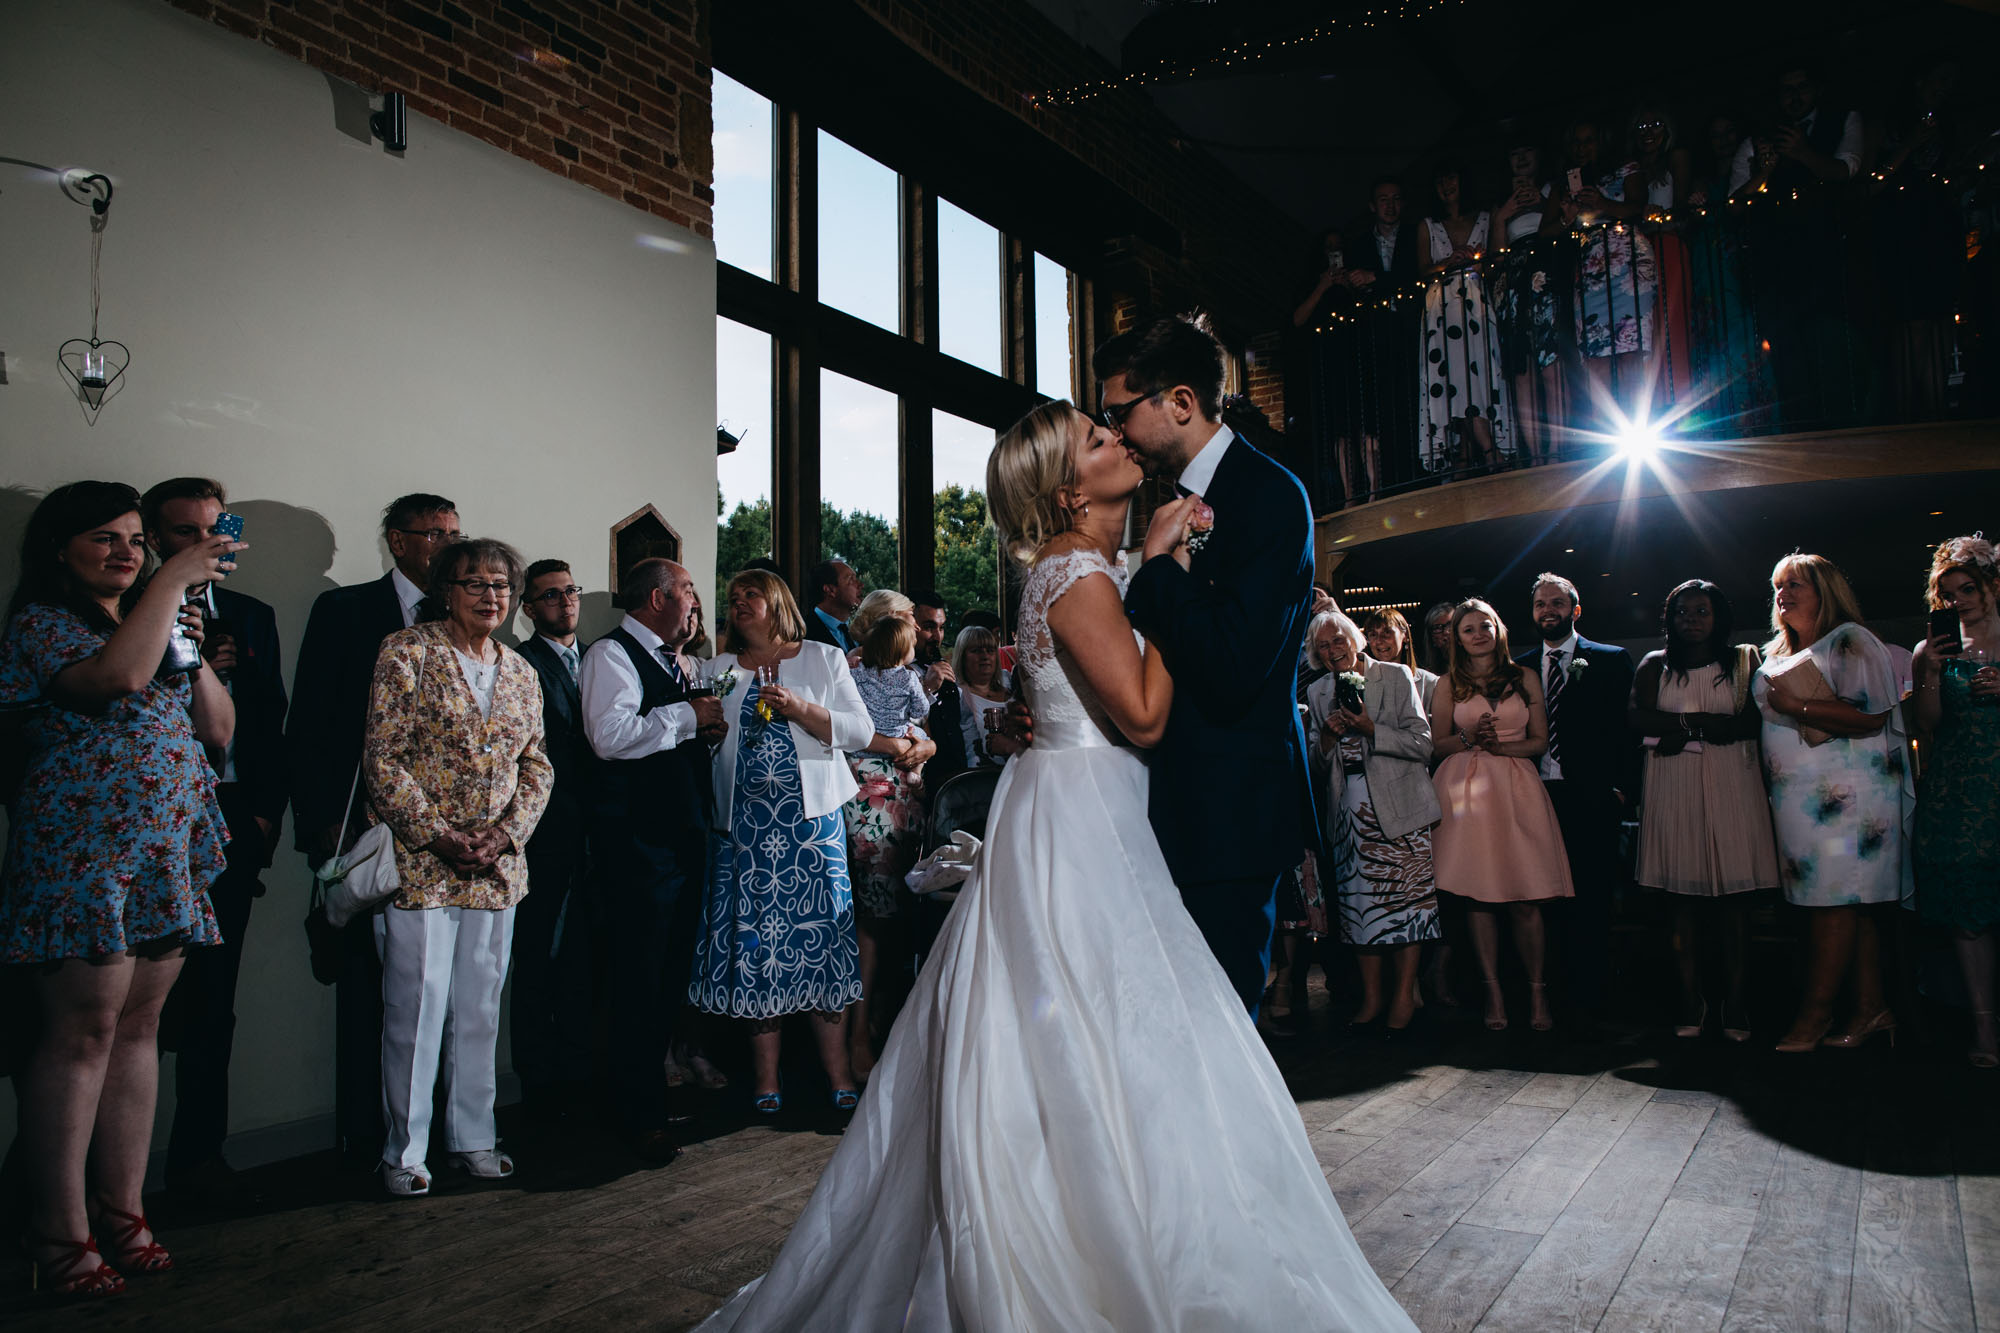 book-theme-wedding-dodmoor-house-60